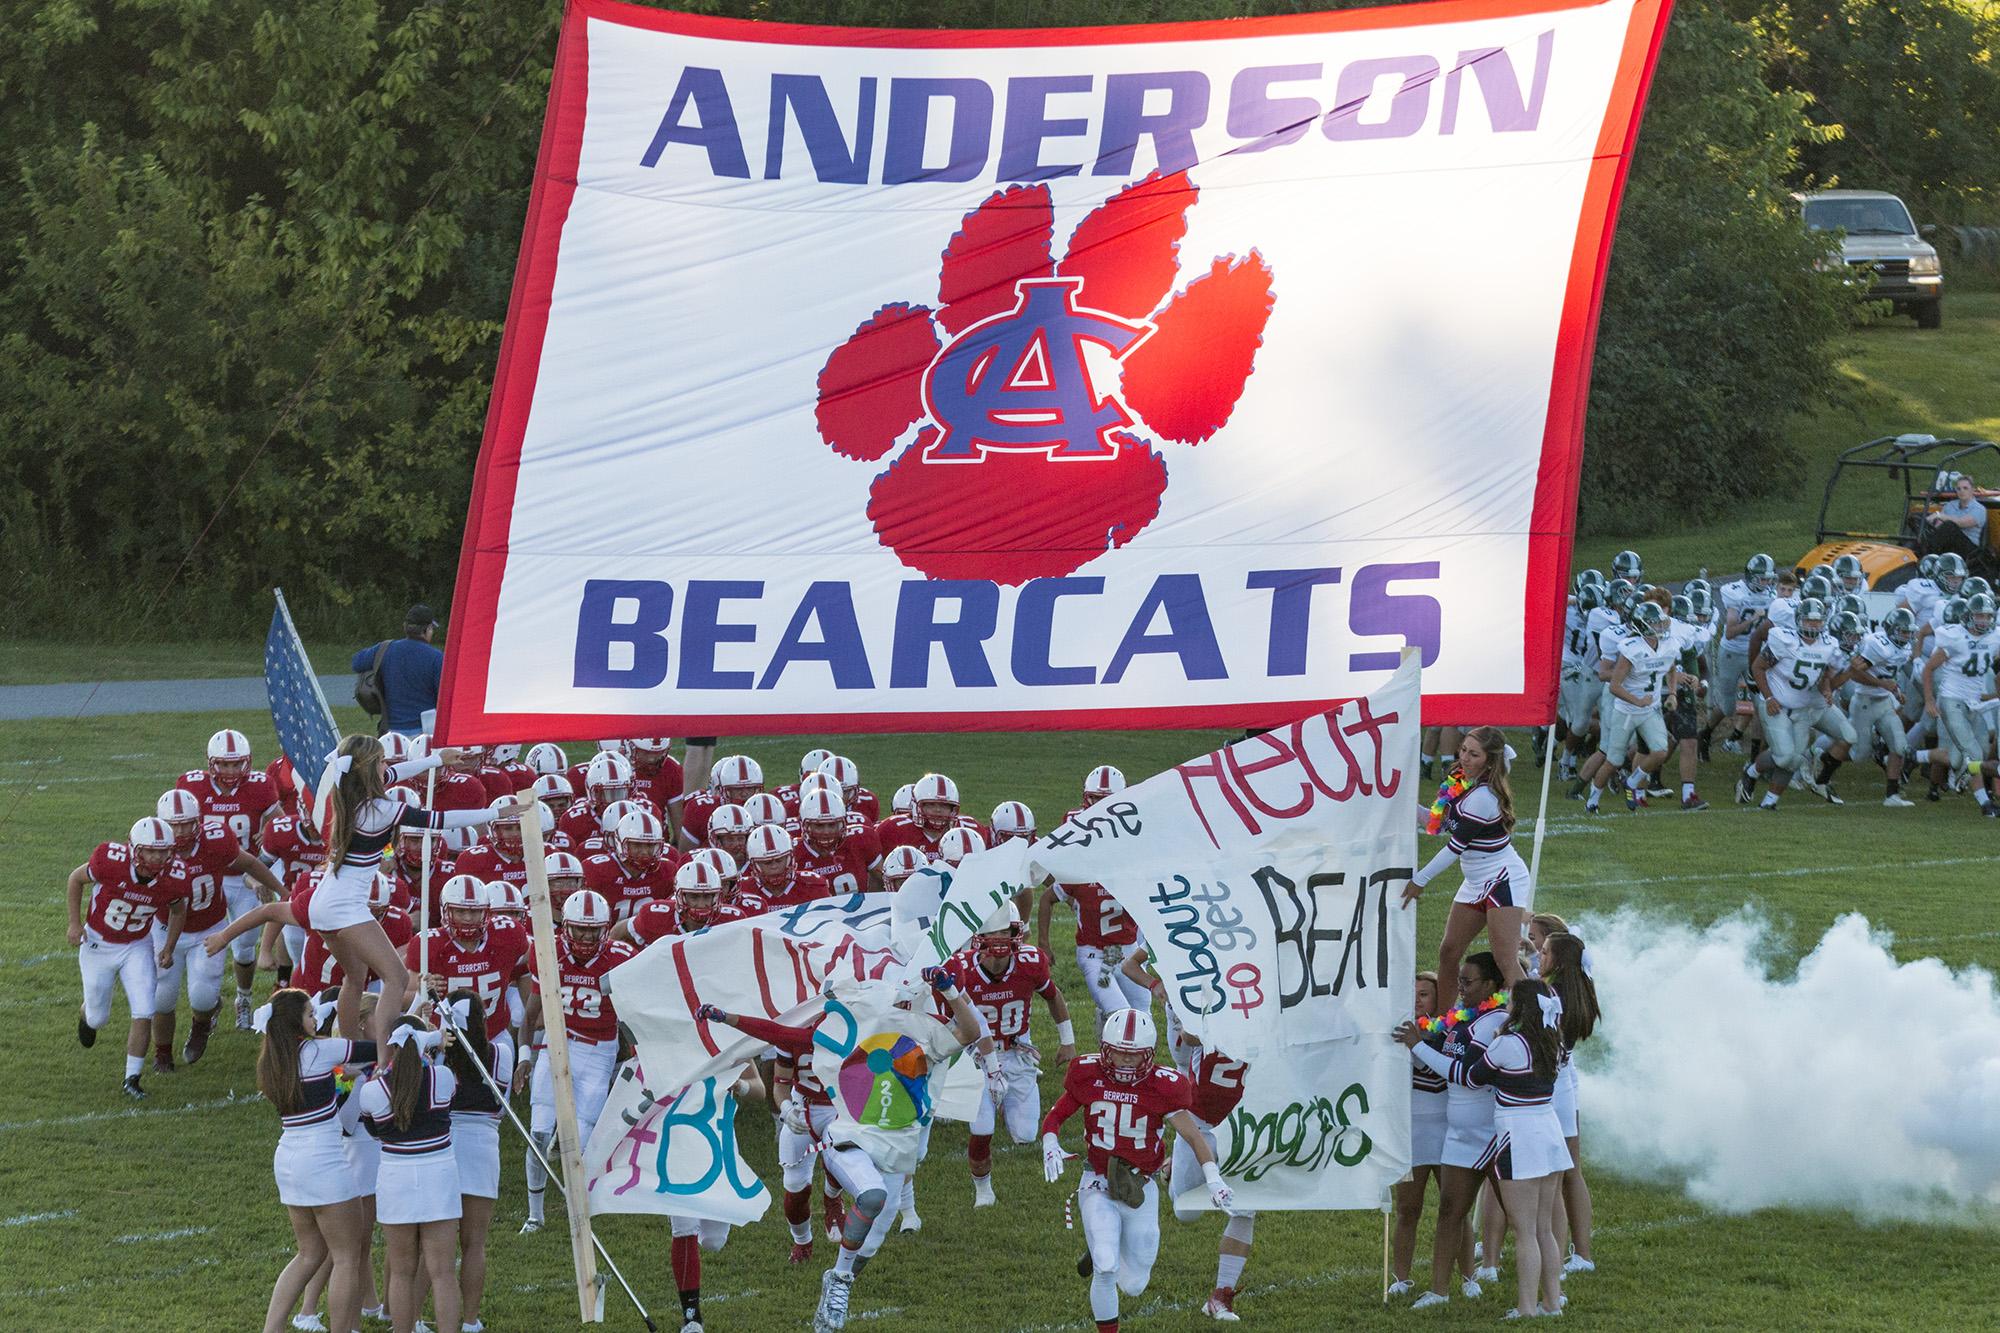 Darion Dearinger De Te Anderson County Class Of 2021 Kentucky